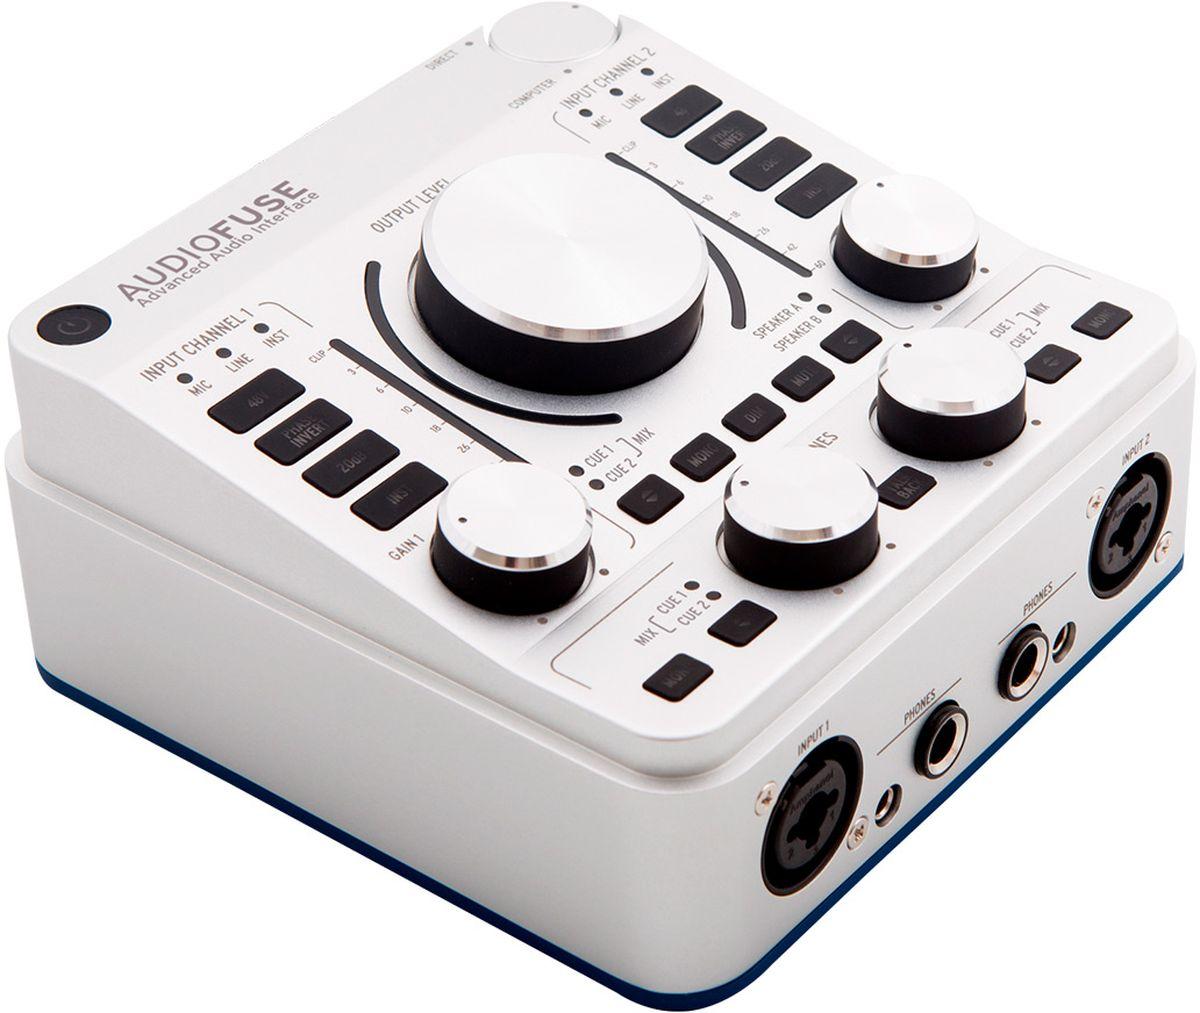 Arturia Audiofuse, Classic Silver аудиоинтерфейс - Студийное оборудование